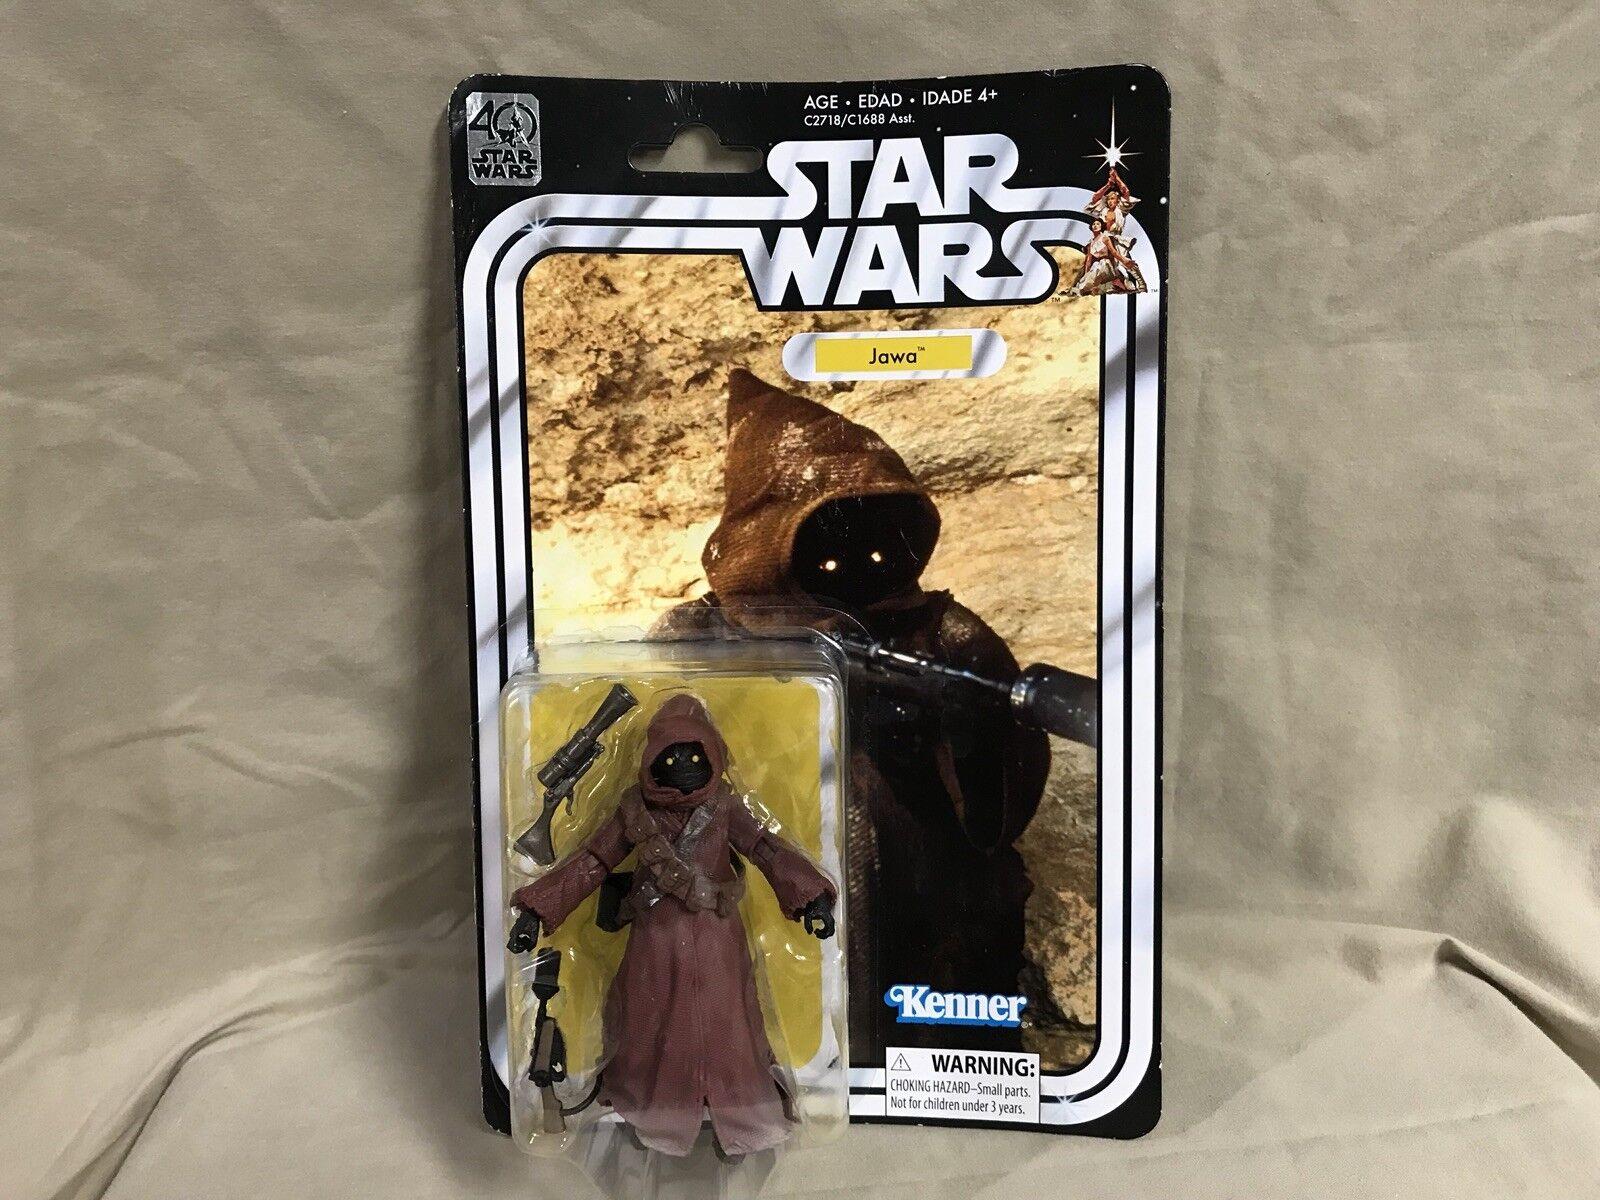 Hasbro C2718 Star Wars 40th Anniversary Black Series 6 Inch Jawa Action Figure